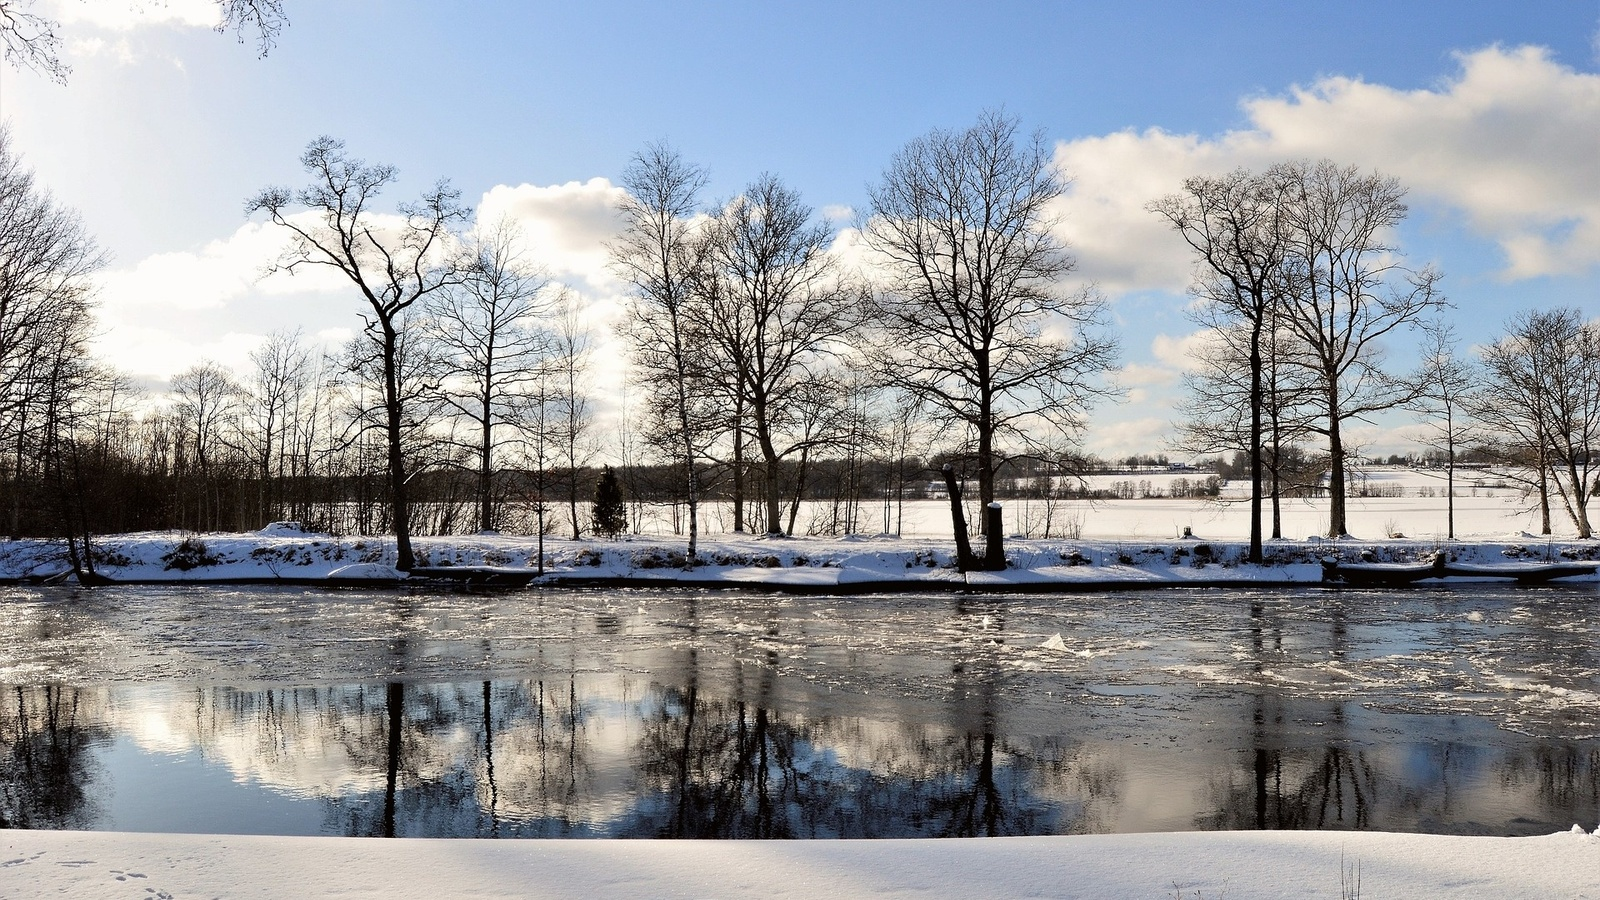 река, деревья, снег